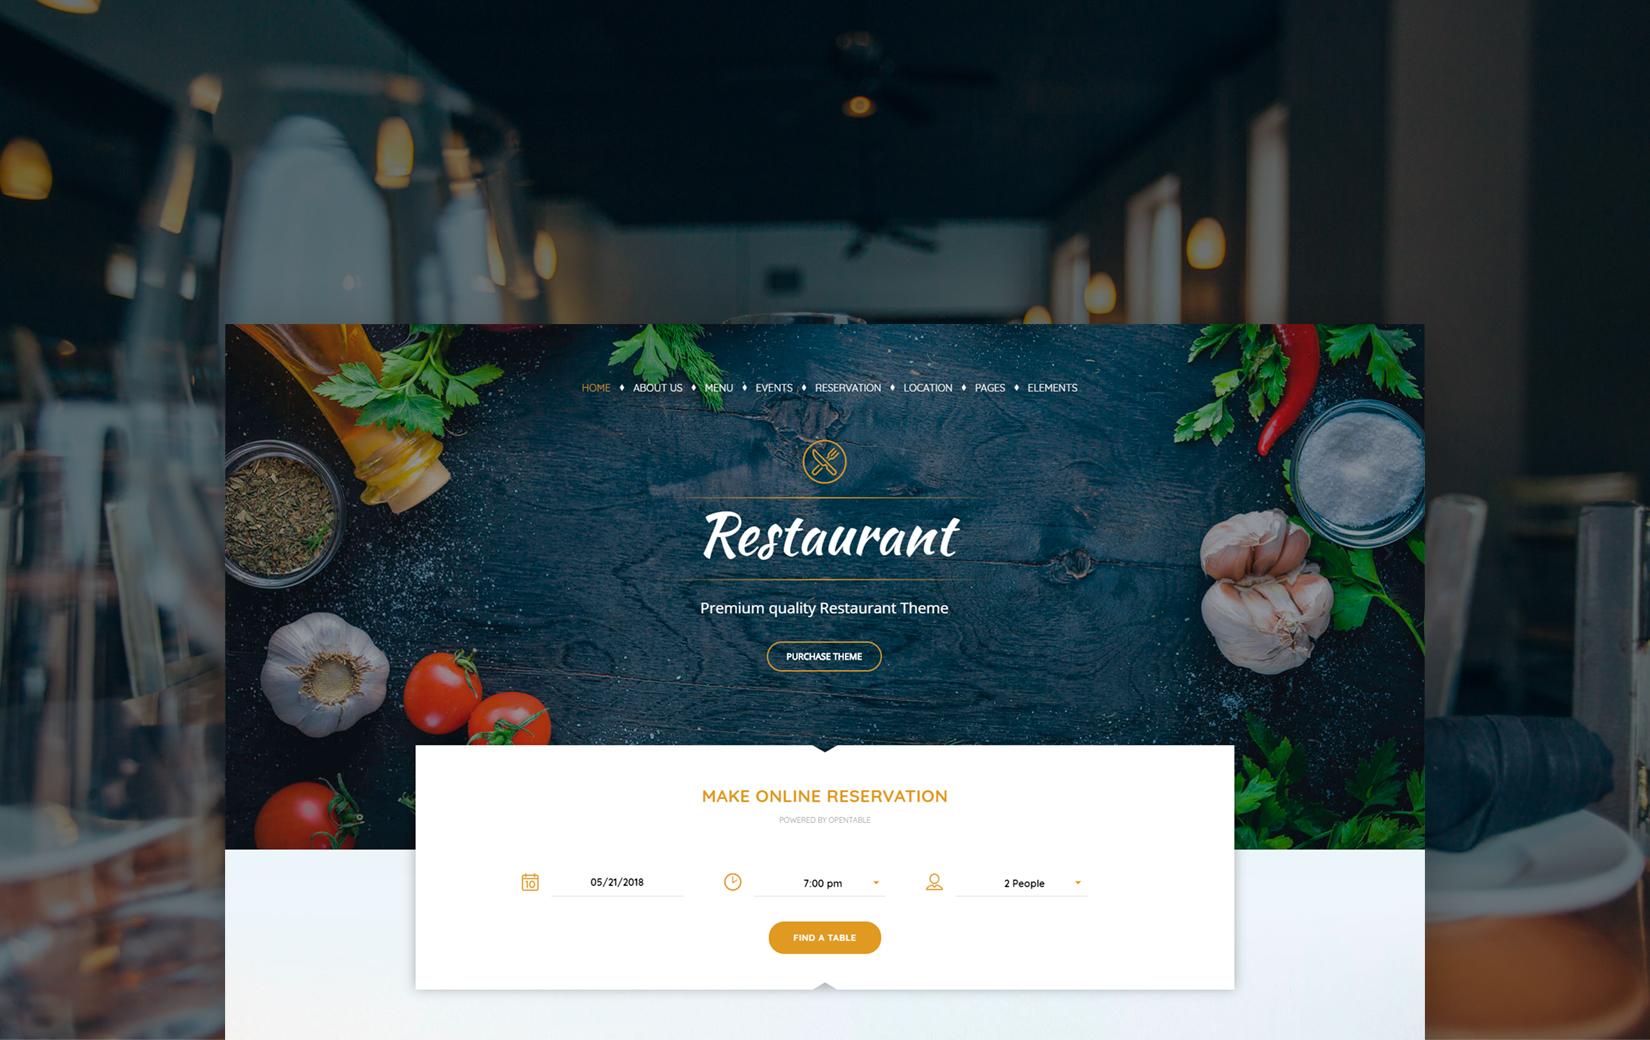 40+ Yummy Food & Restaurant WordPress Themes in 2019 | StylemixThemes